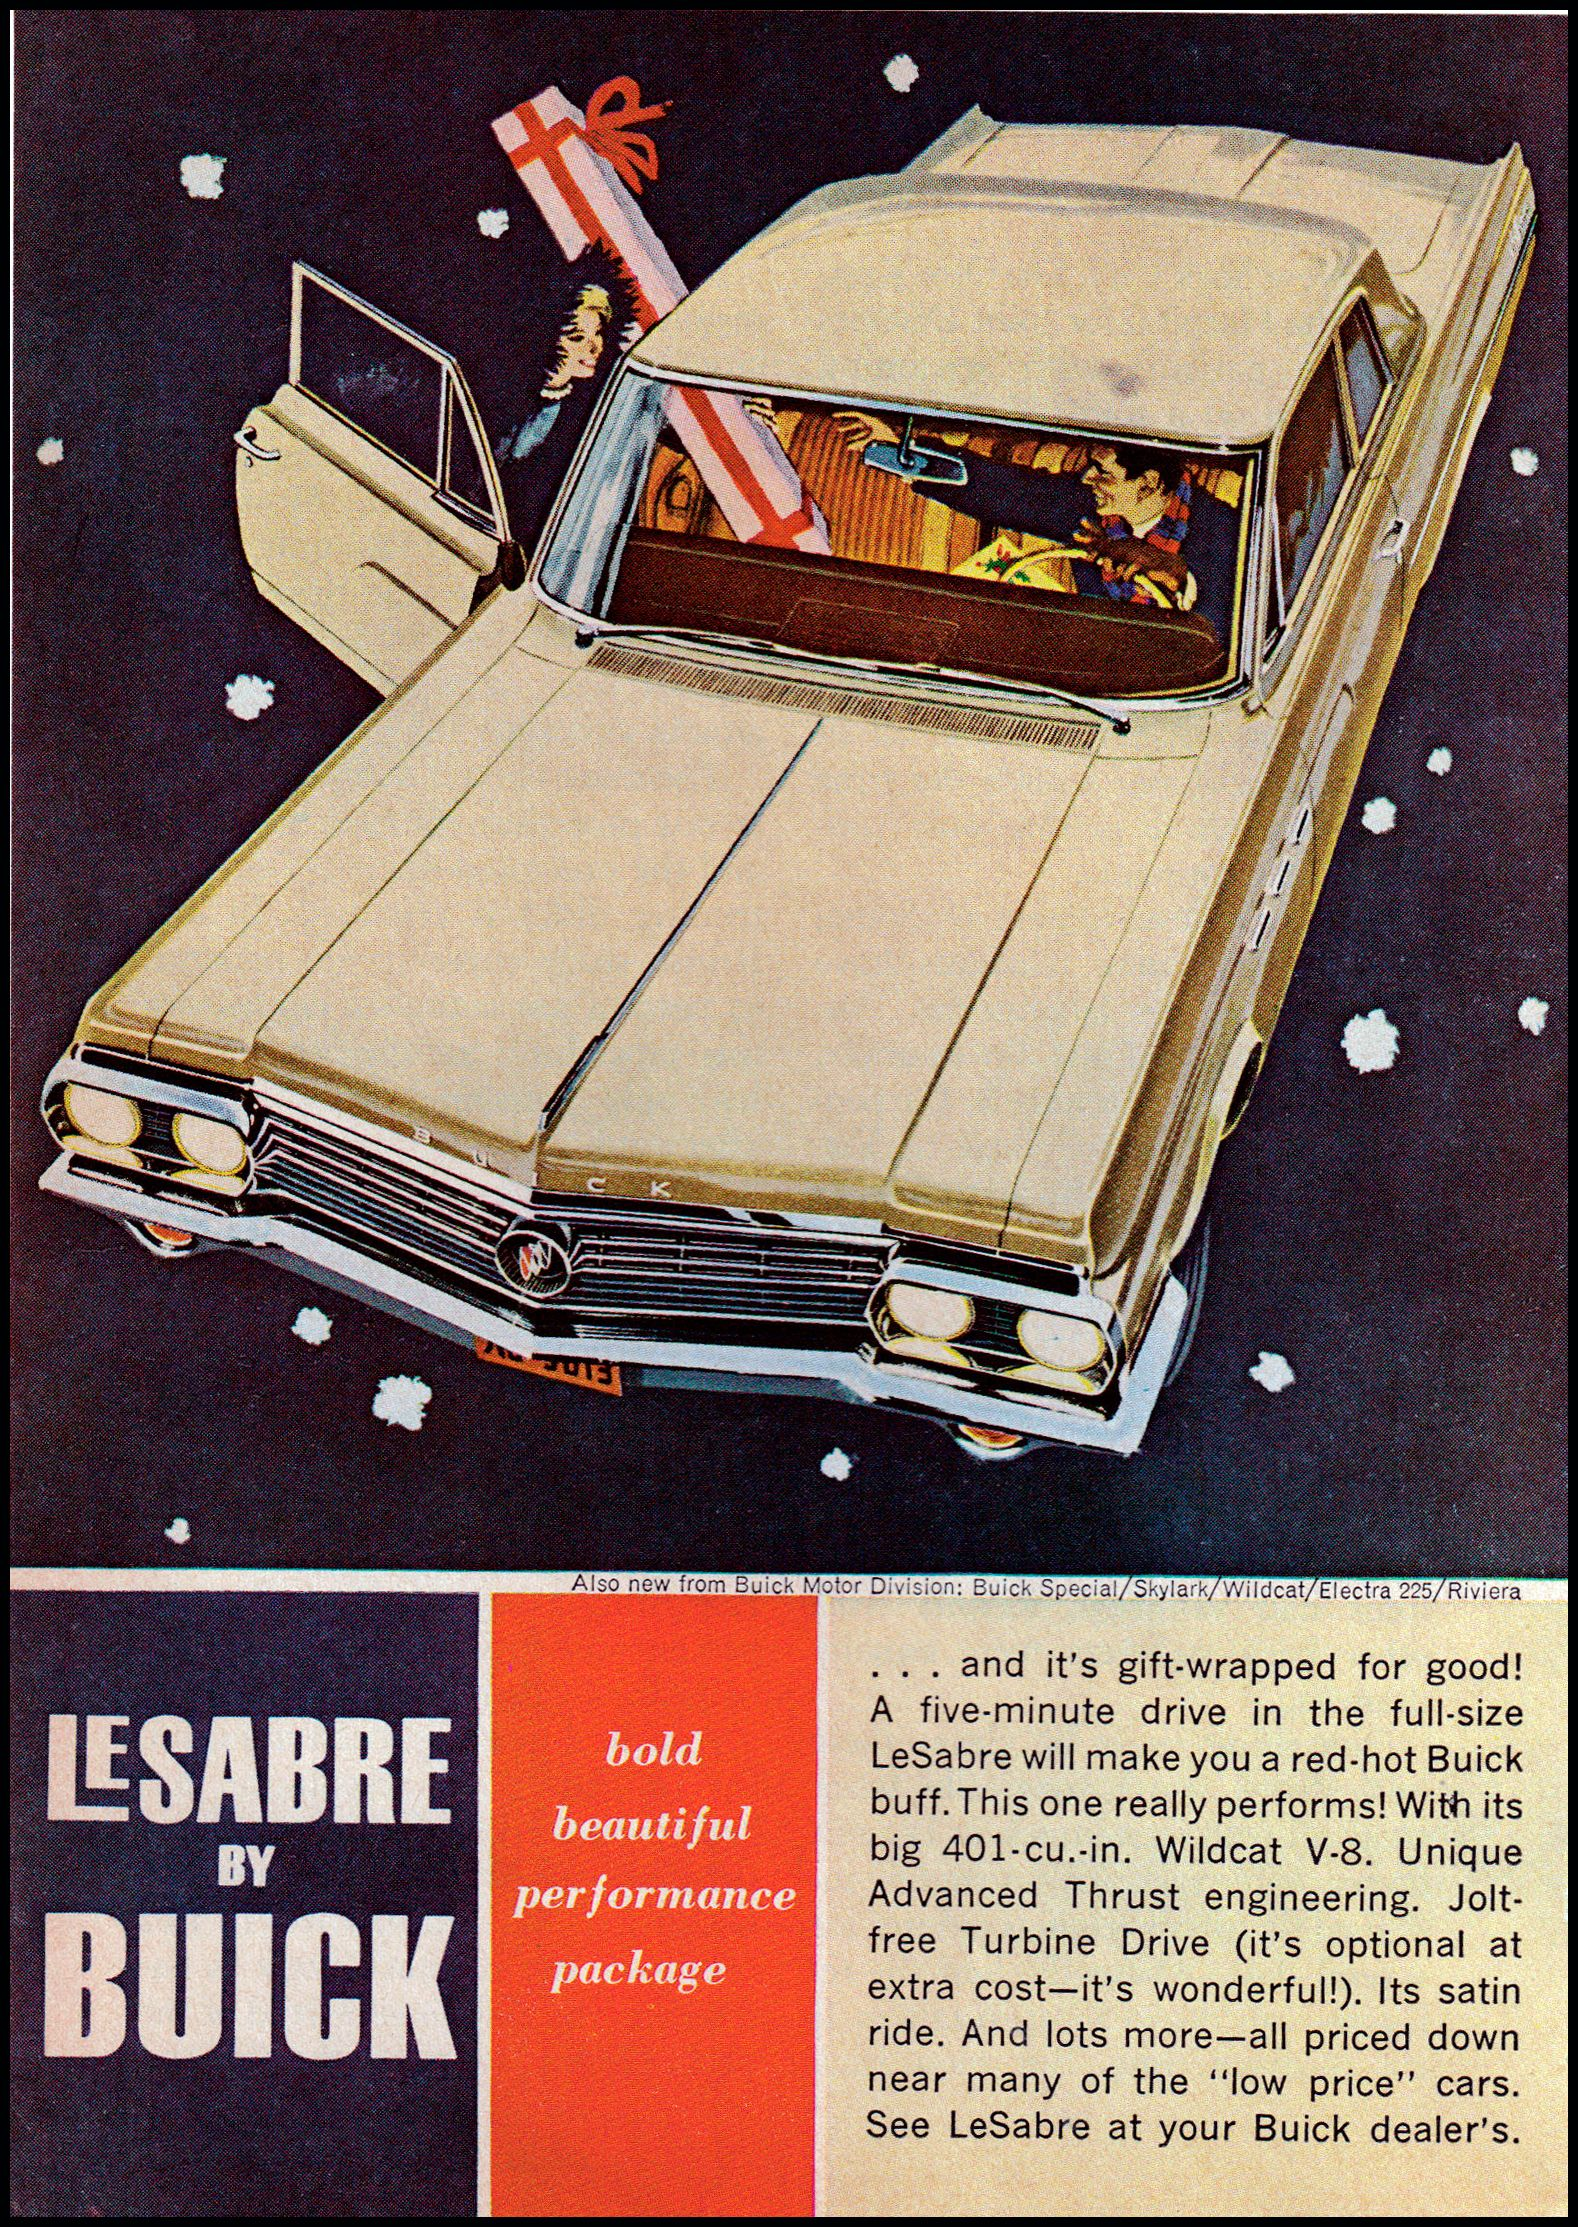 1962 CHRISTMAS Buick LeSabre